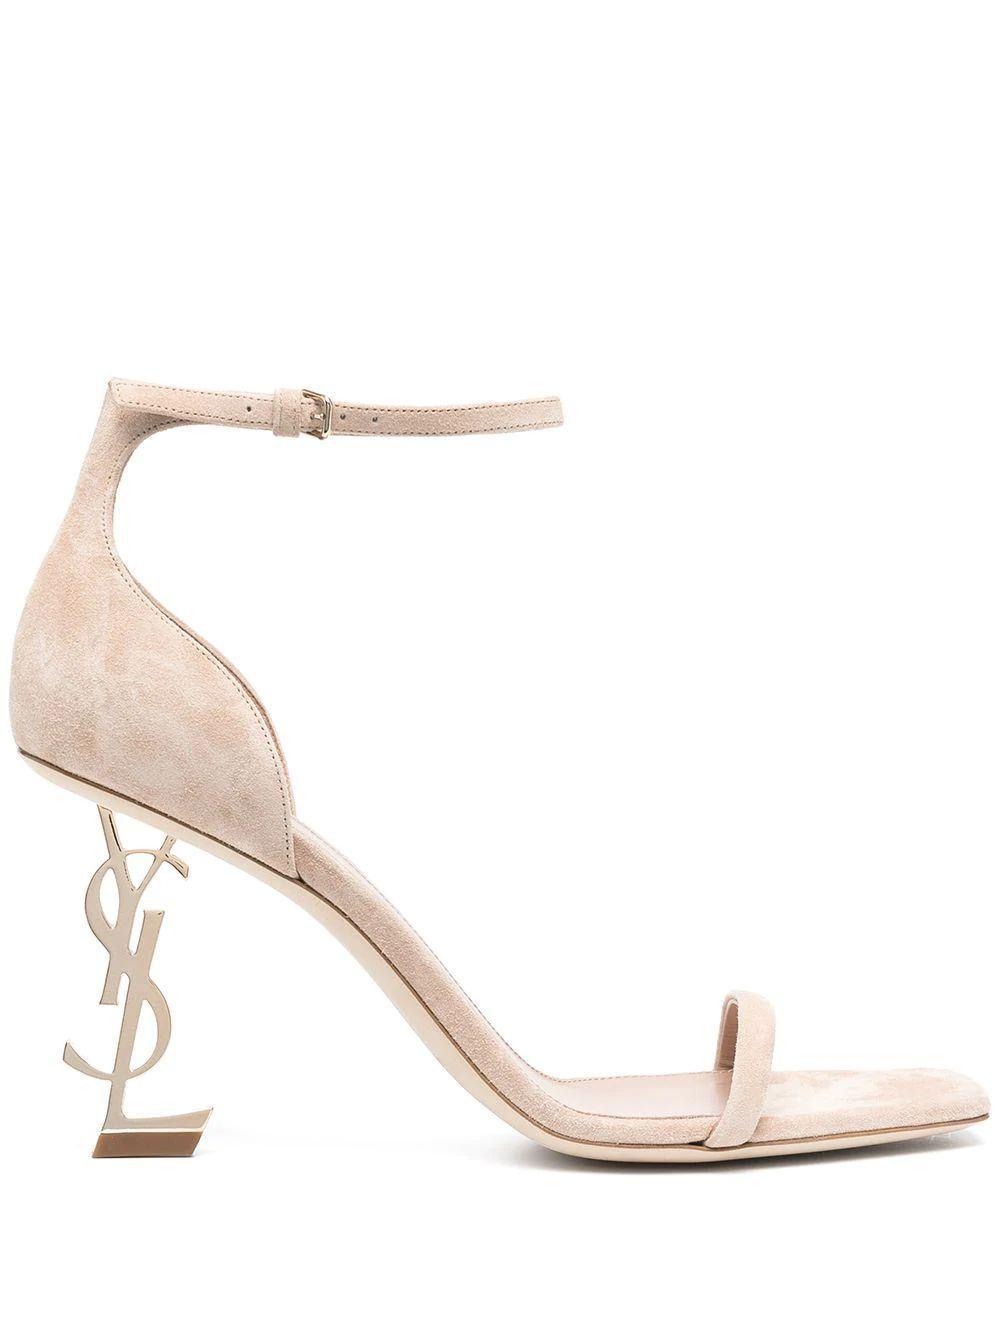 Opyum 85mm Sandal Item # 5576790LIJJ